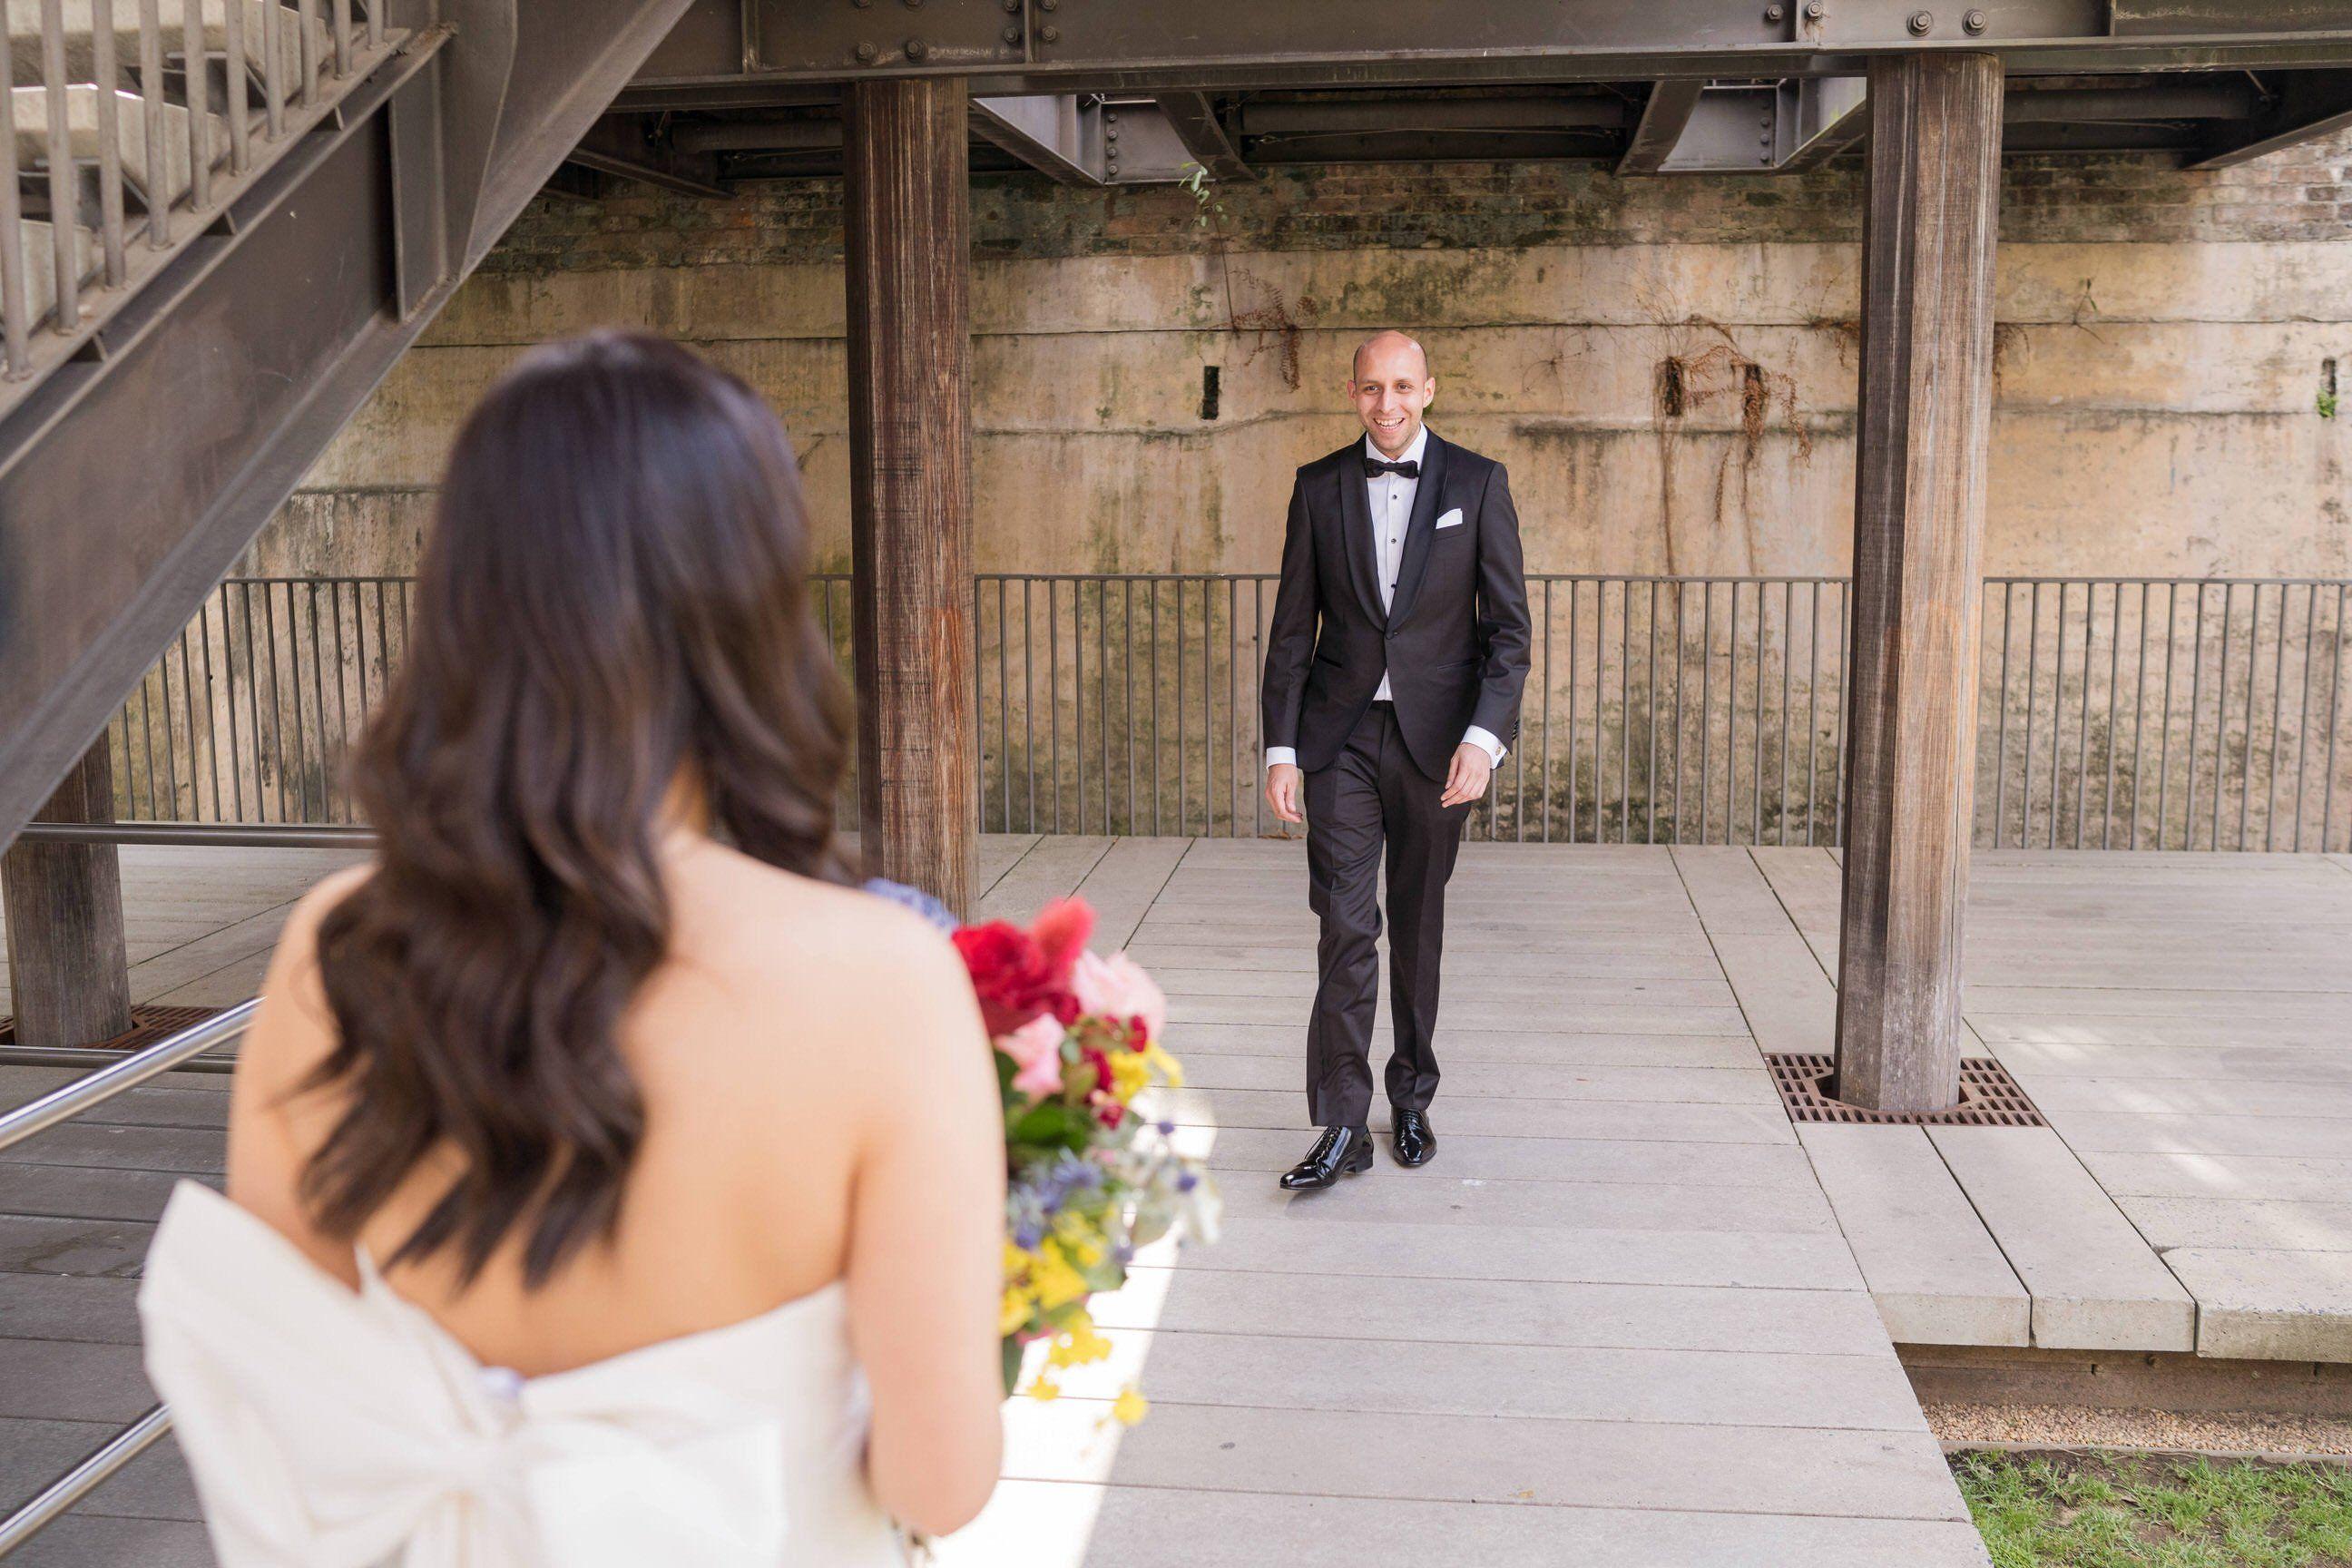 bride, groom, wedding flowers, wedding dress, wedding venue